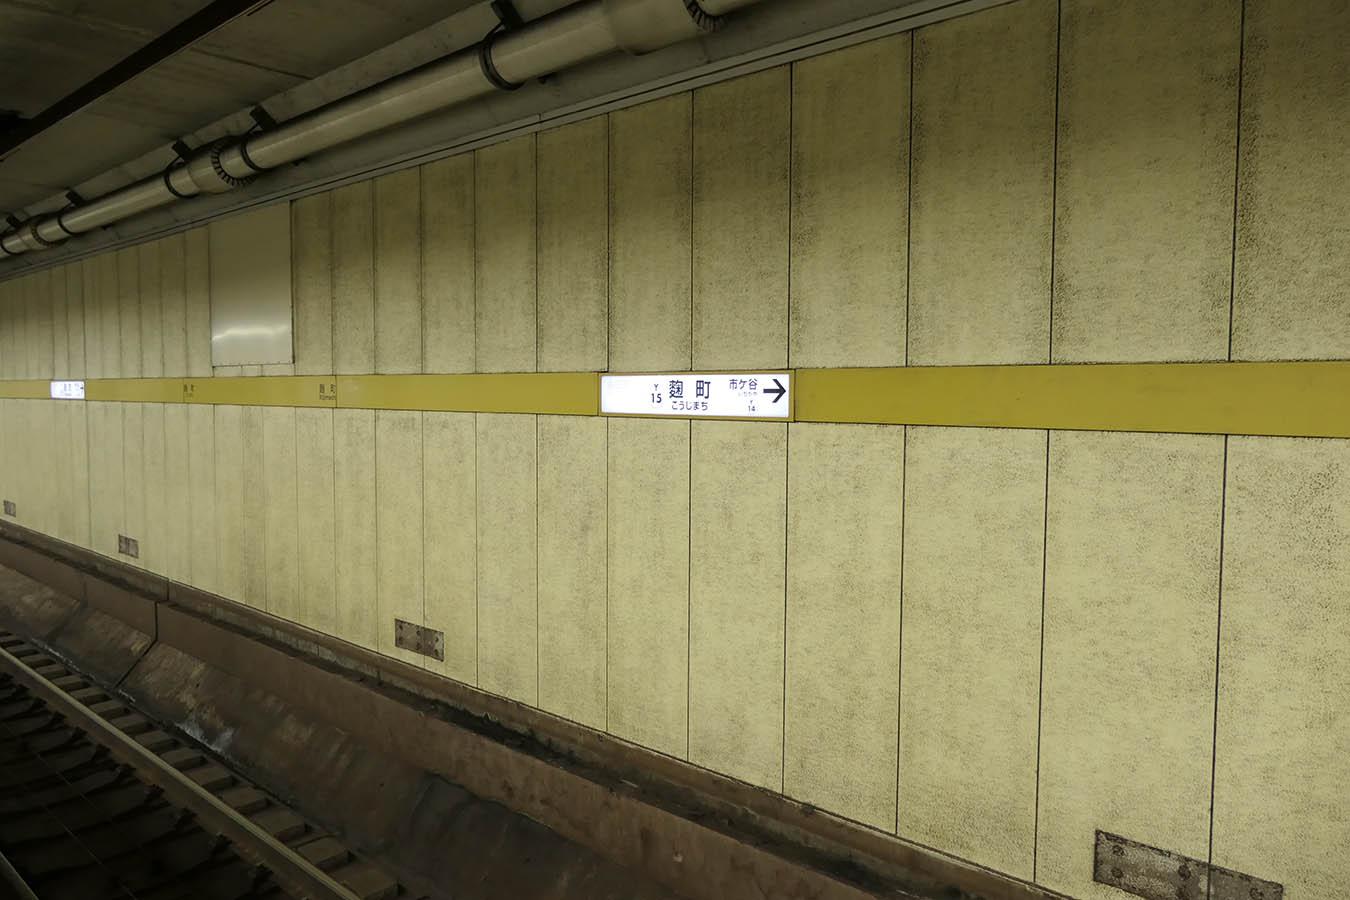 Y15_photo02.jpg